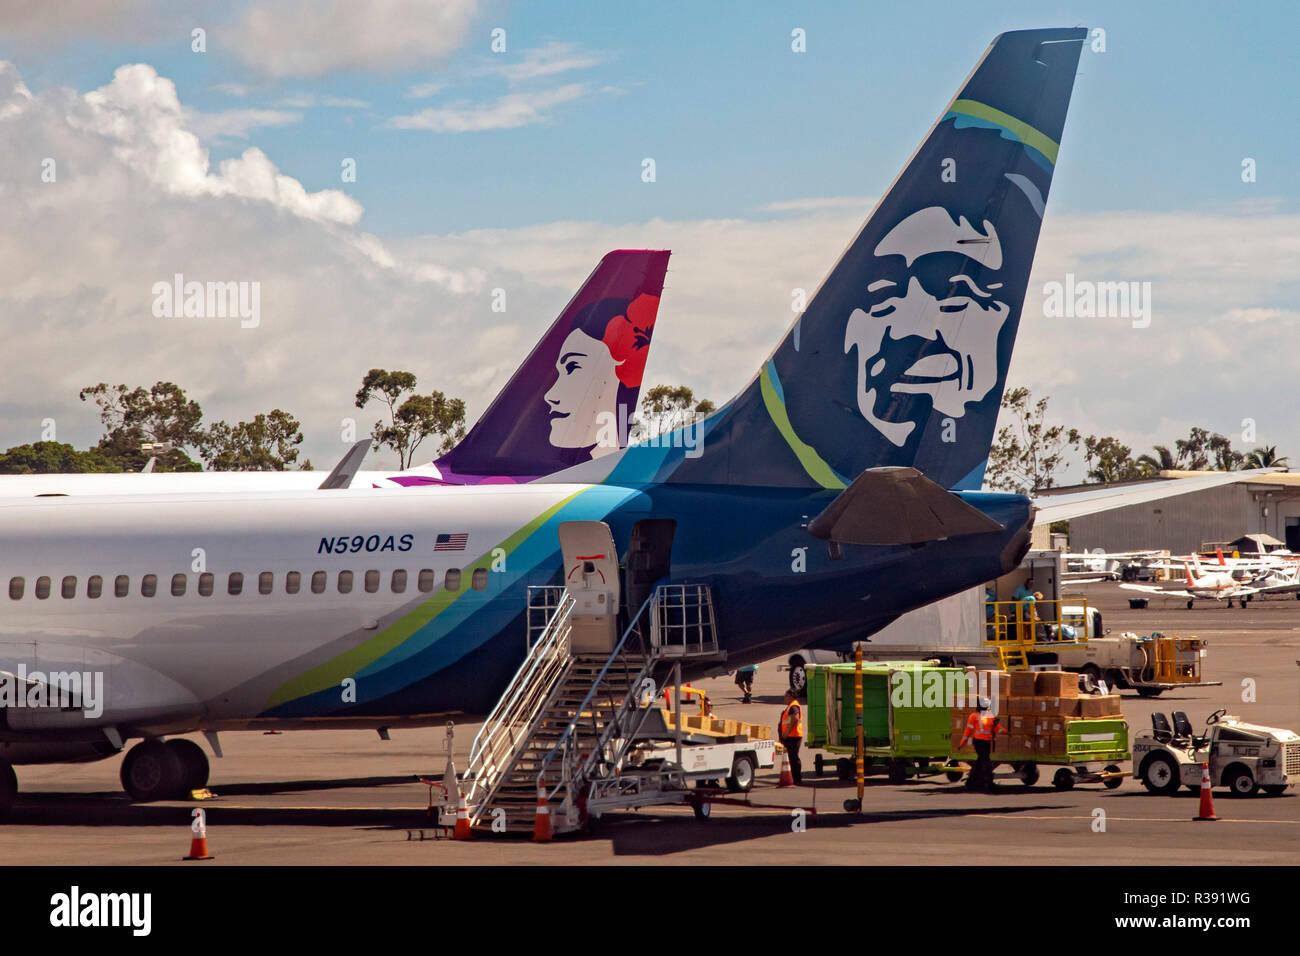 Kailua-Kona, Hawaii - Alaska Airlines und Hawaiian Airlines Jet Flugzeuge am internationalen Flughafen Kona auf Hawaii Big Island. Stockfoto